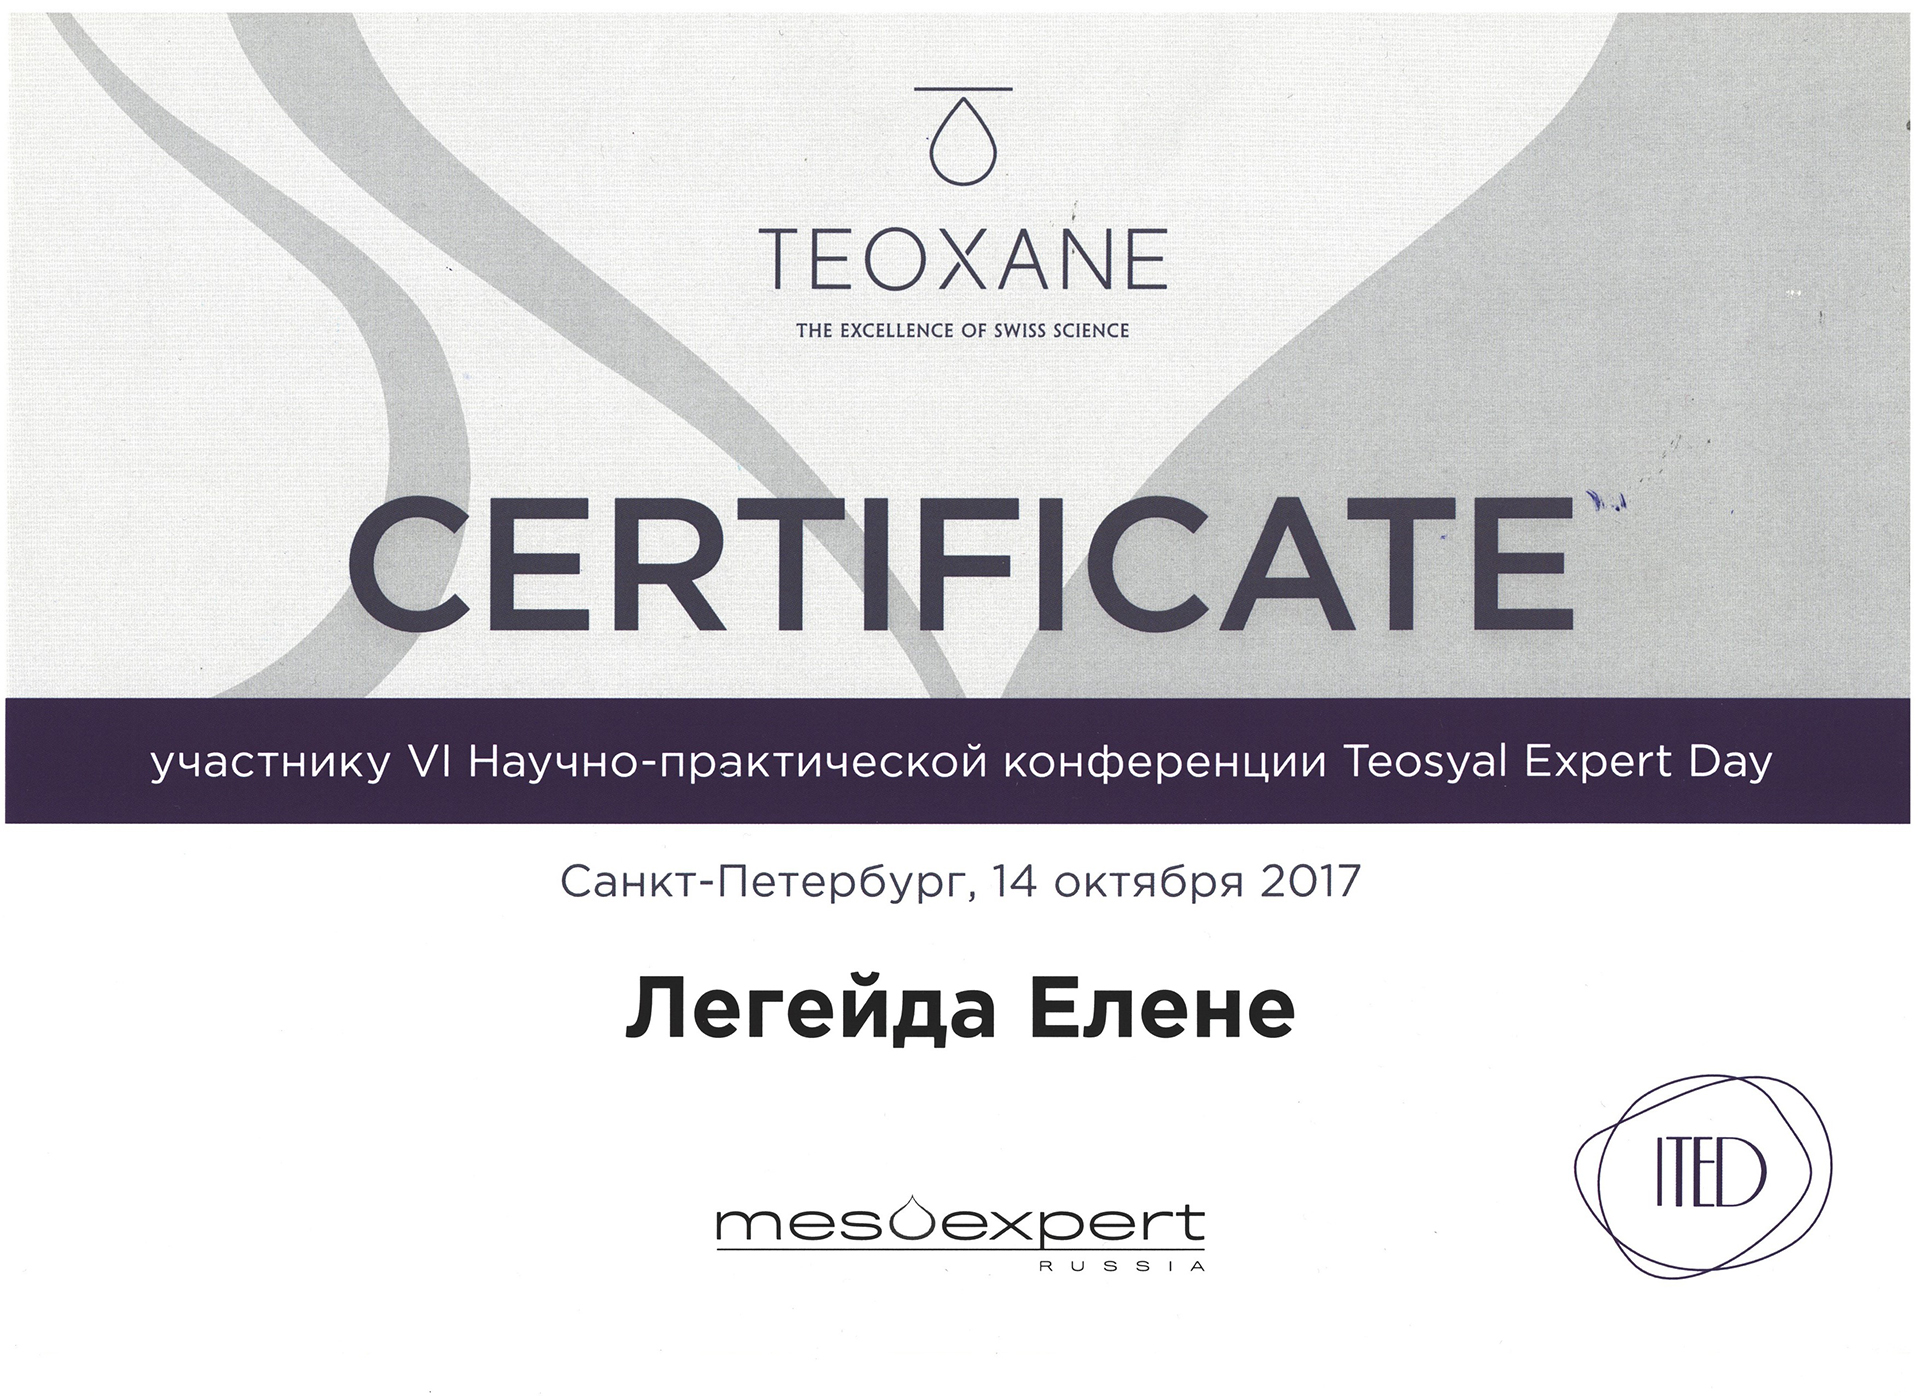 Сертификат — Конференция Teosyal Expert Day. Легейда Елена Валерьевна